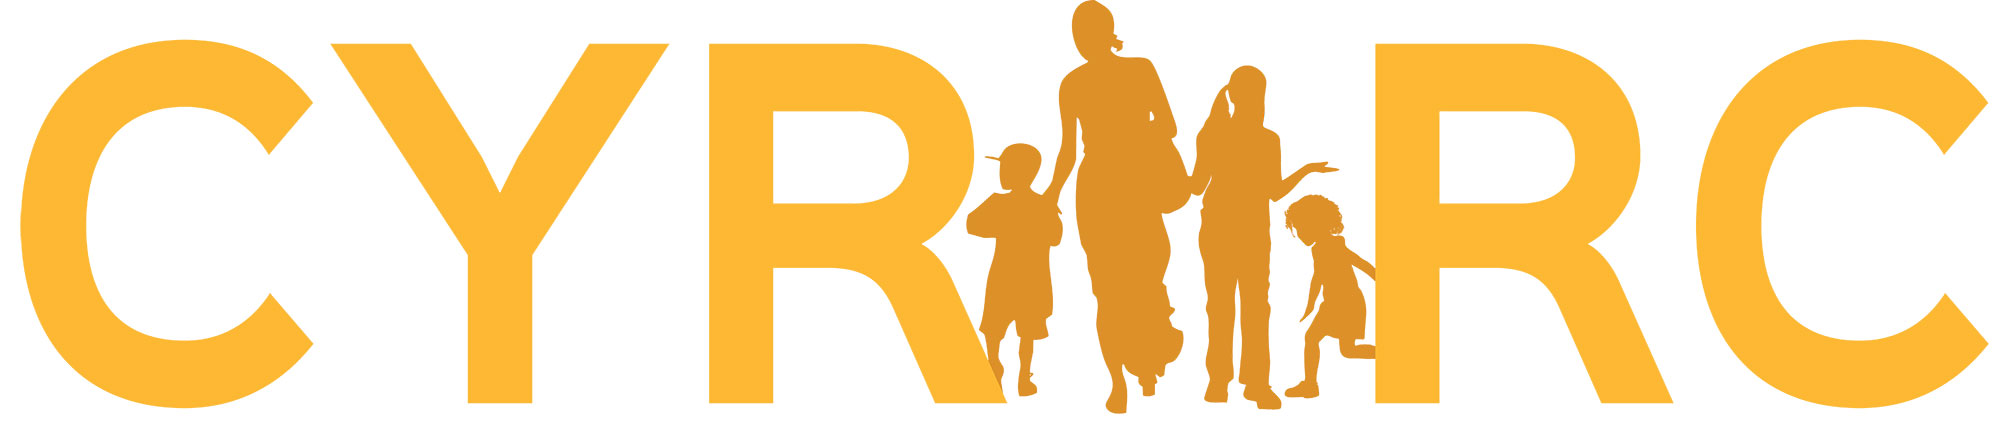 CYRRC Logo